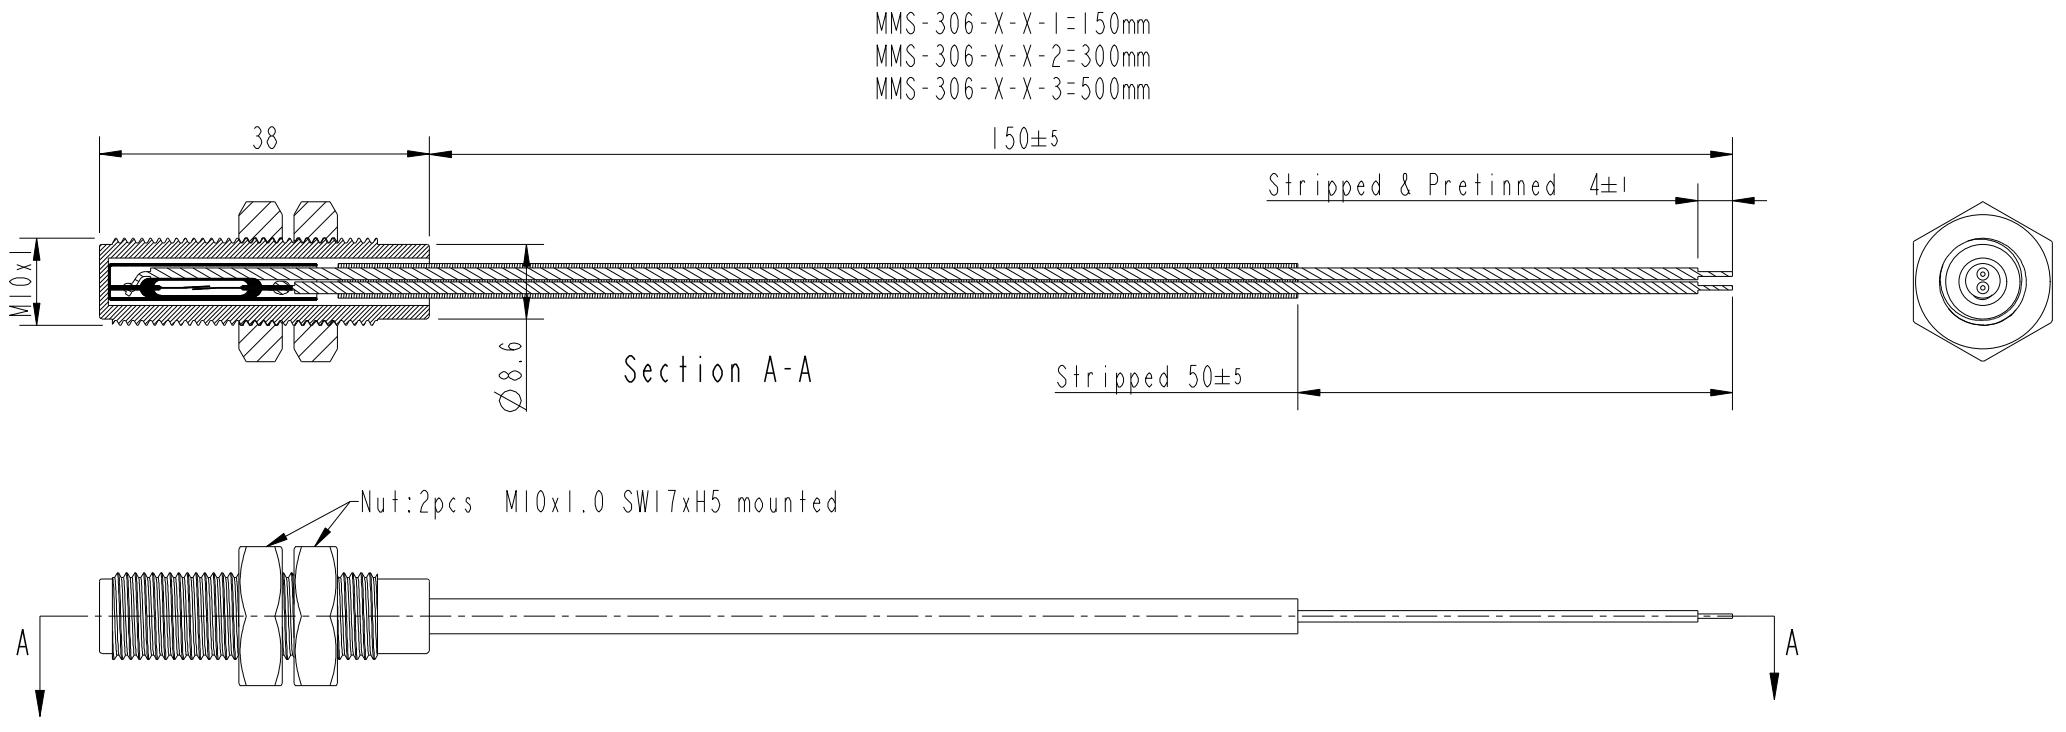 MMS-306